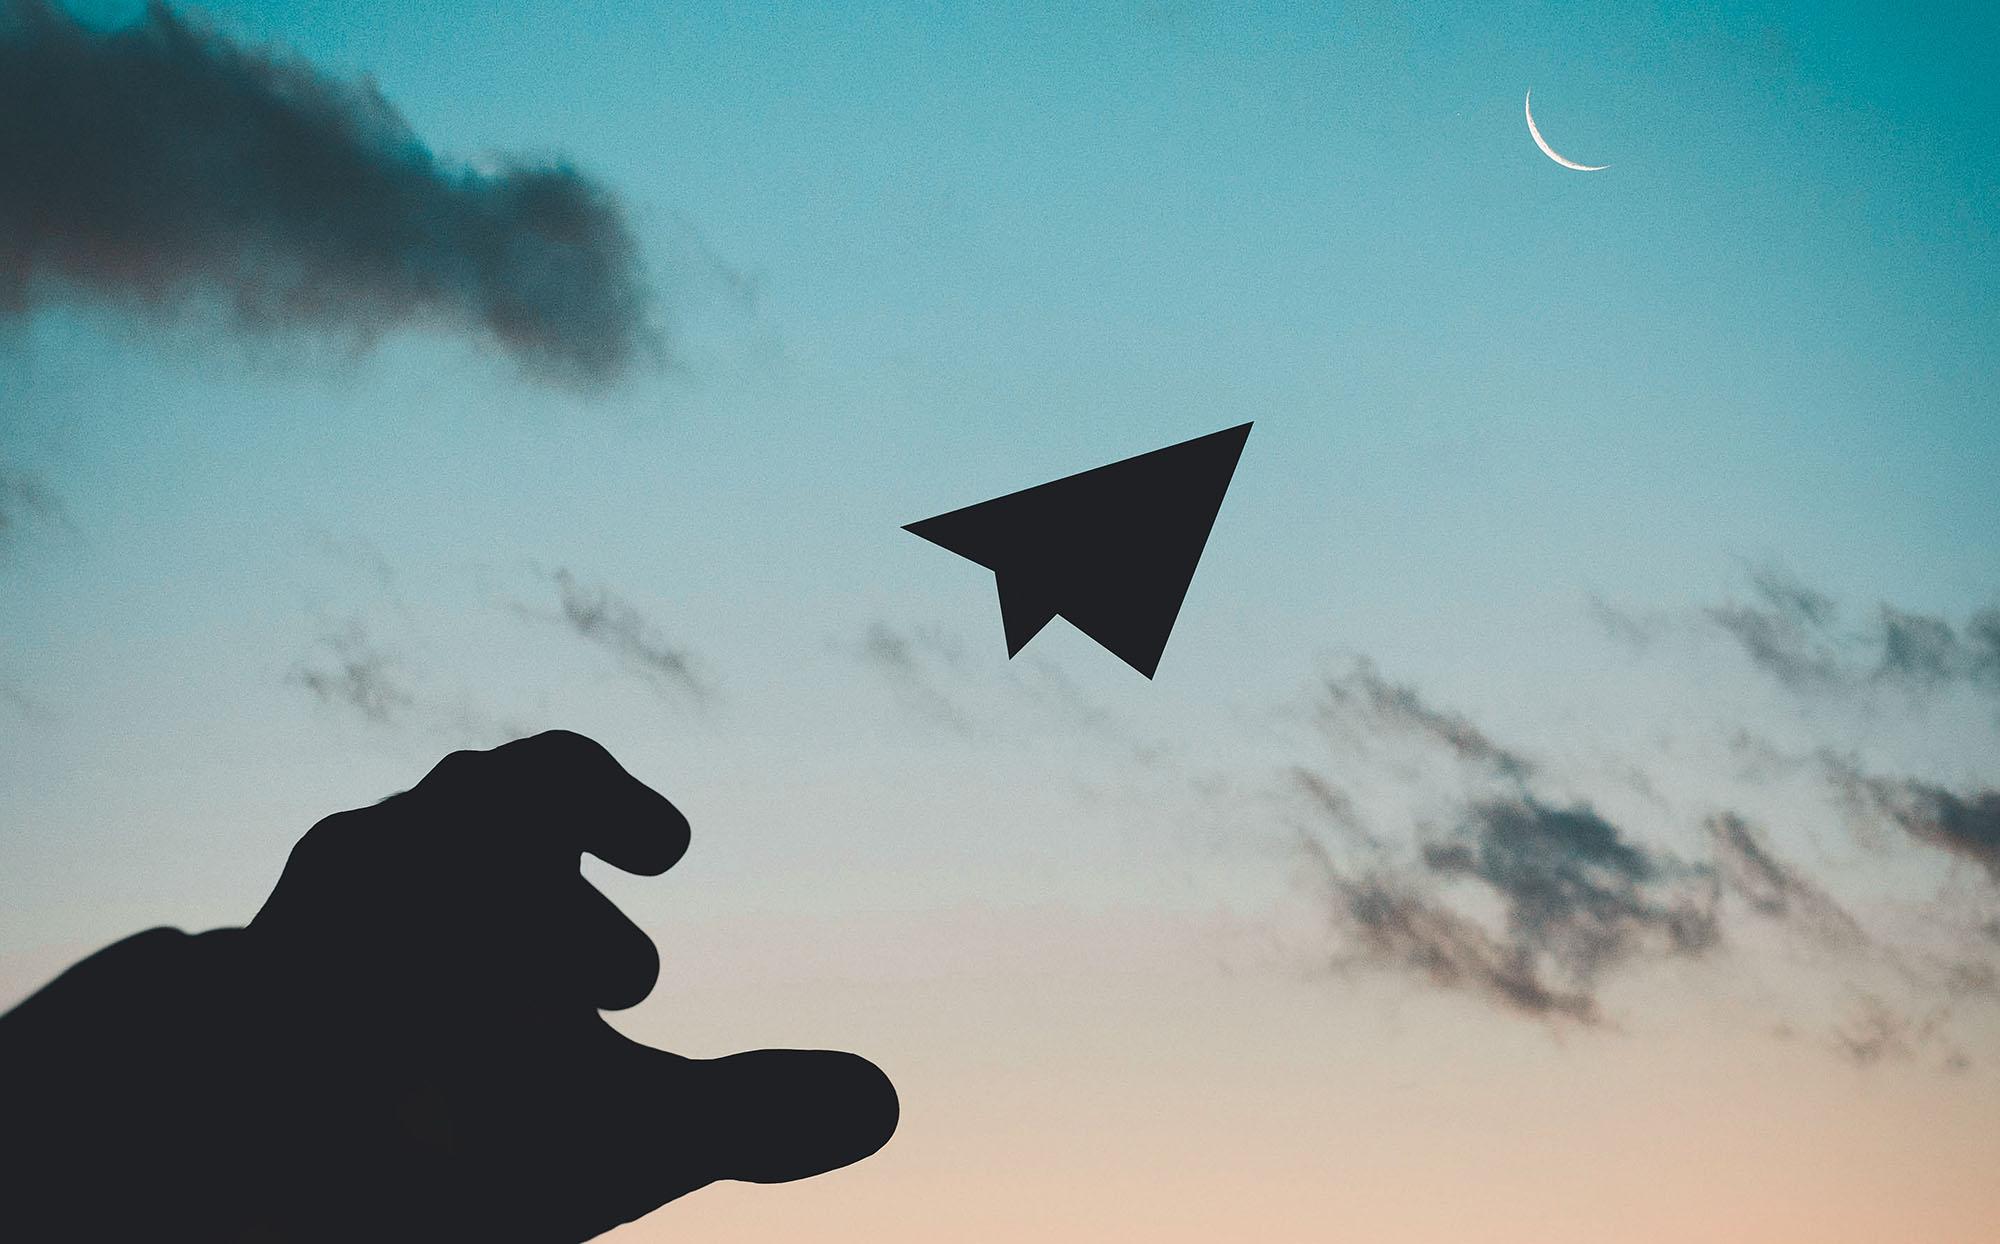 airplane-backlit-clouds-1262304